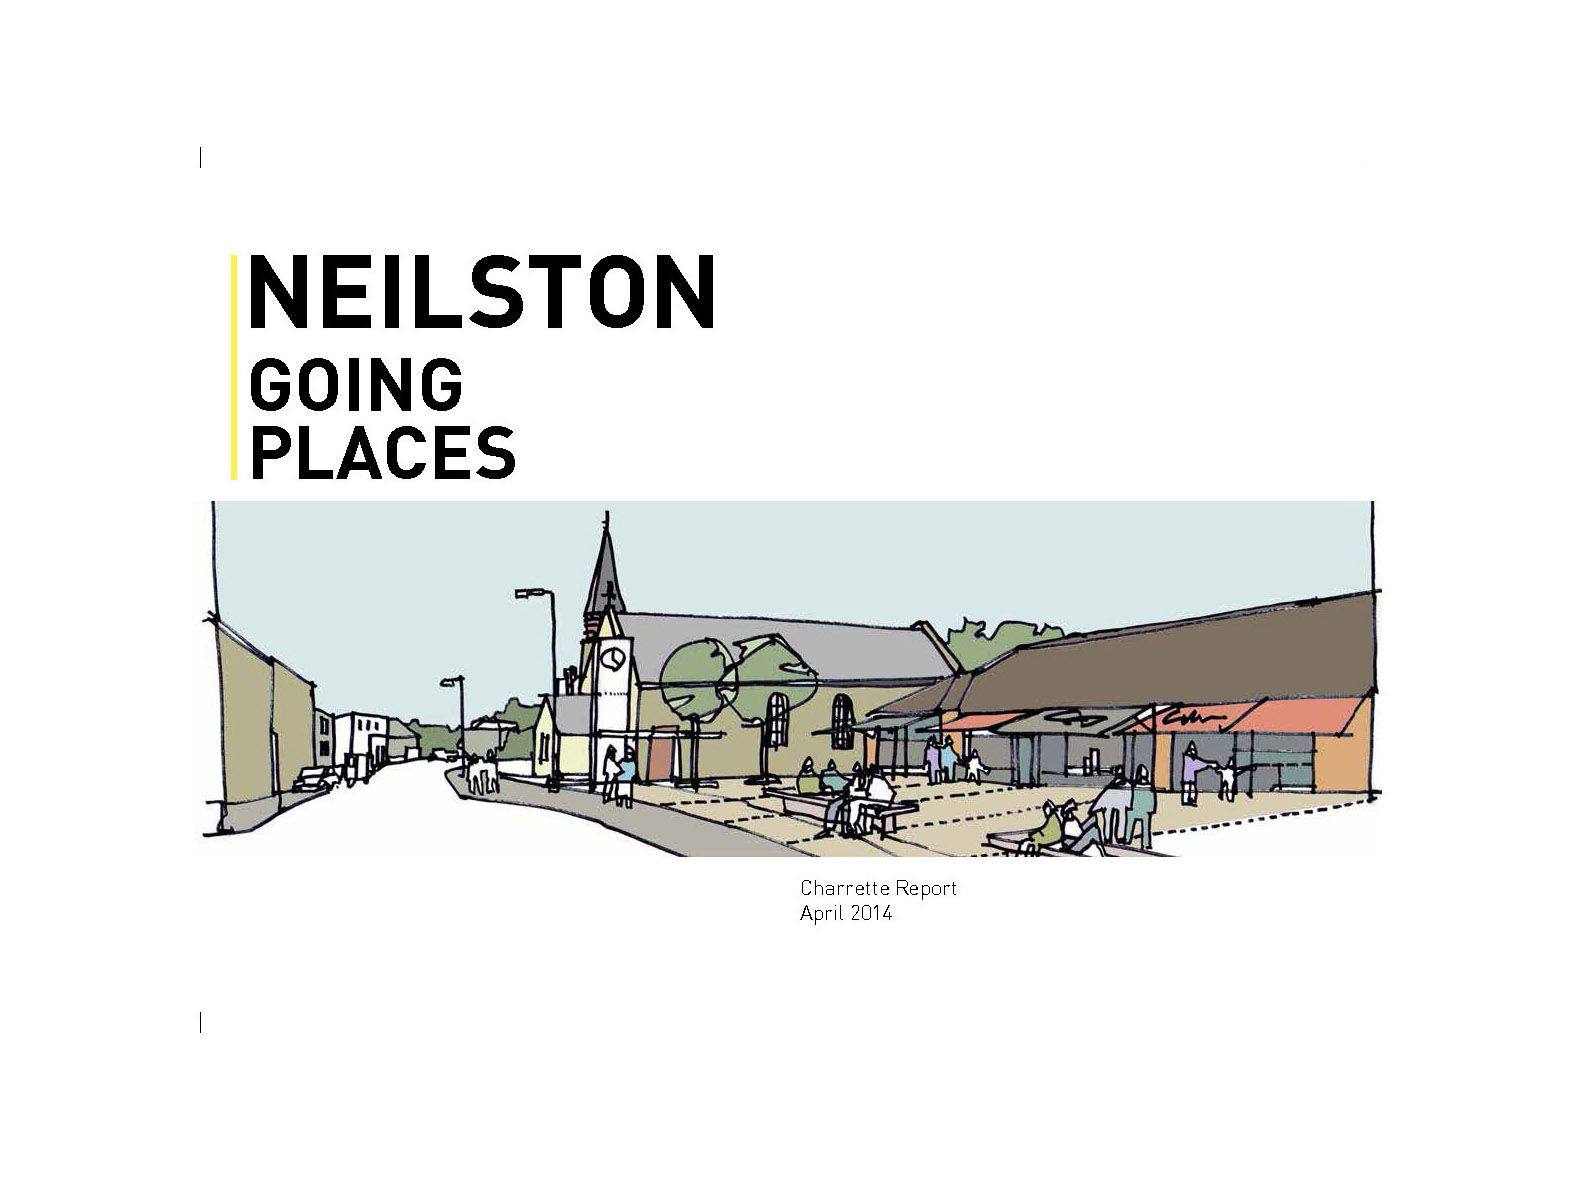 Neilston Charrette Report5.jpg